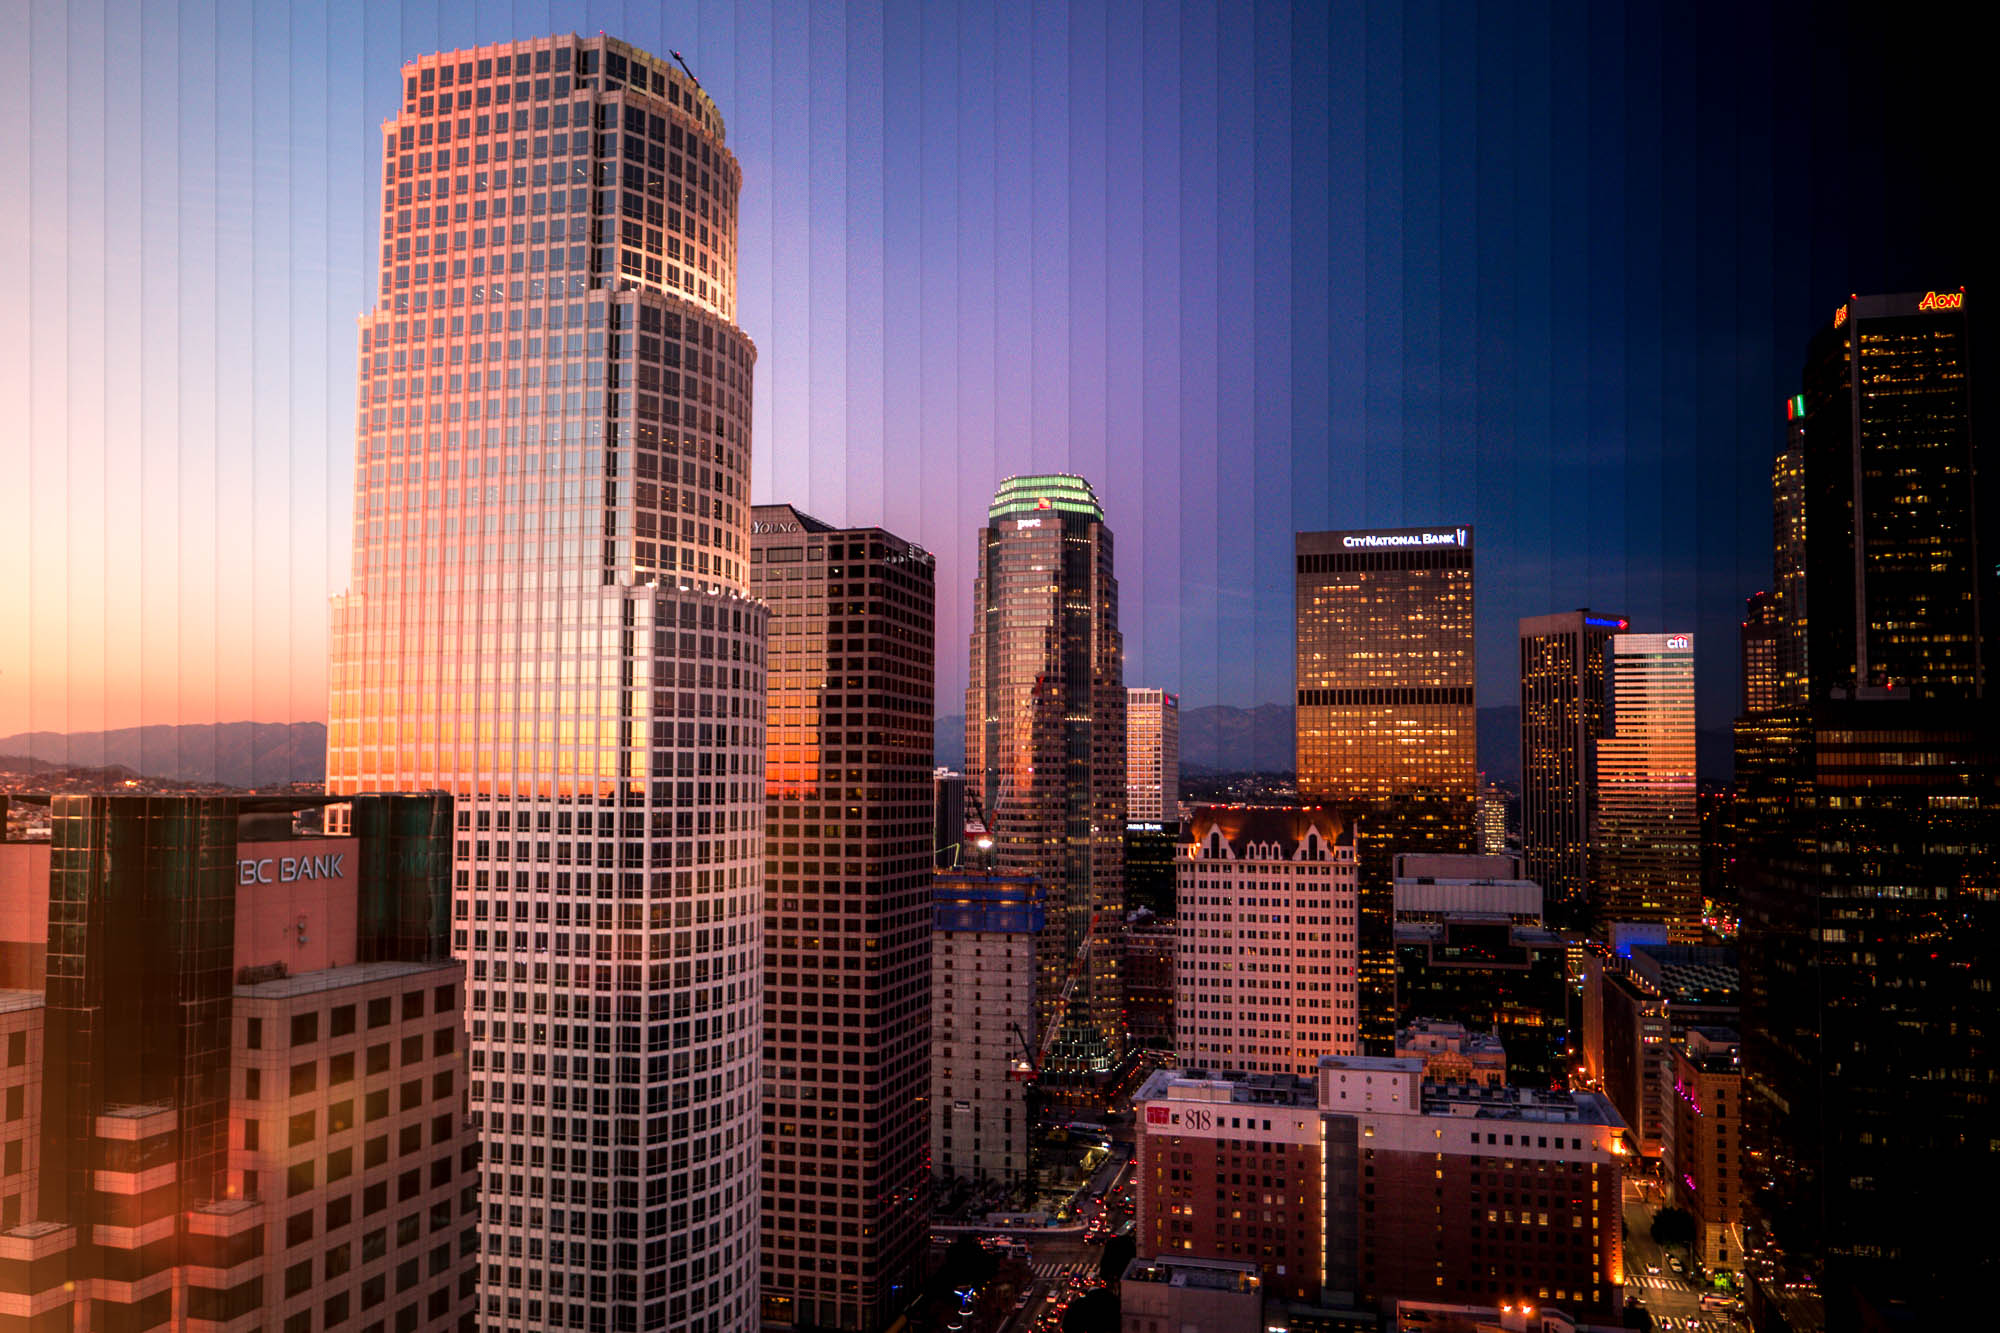 Los Angeles 56 Photos over 1hr 20min